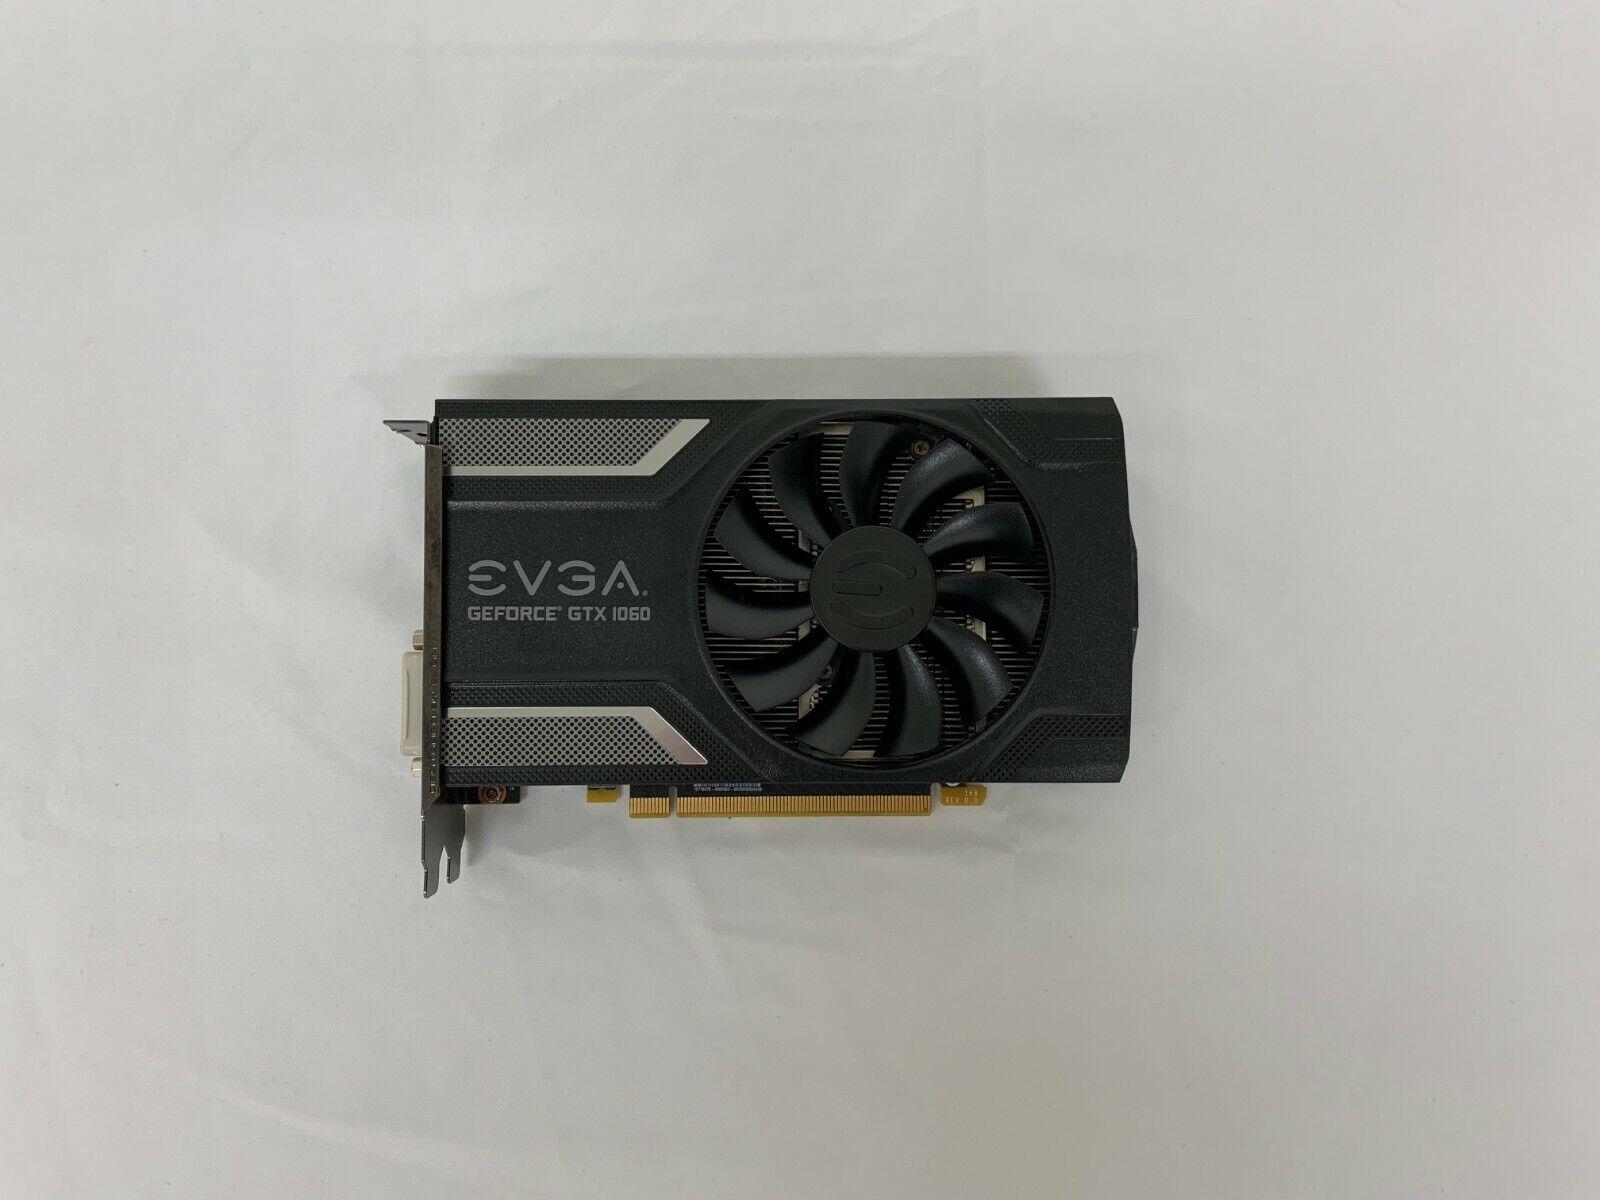 EVGA NVIDIA Geforce GTX 1060 6GB GDDR5 Mini Graphics Card 2